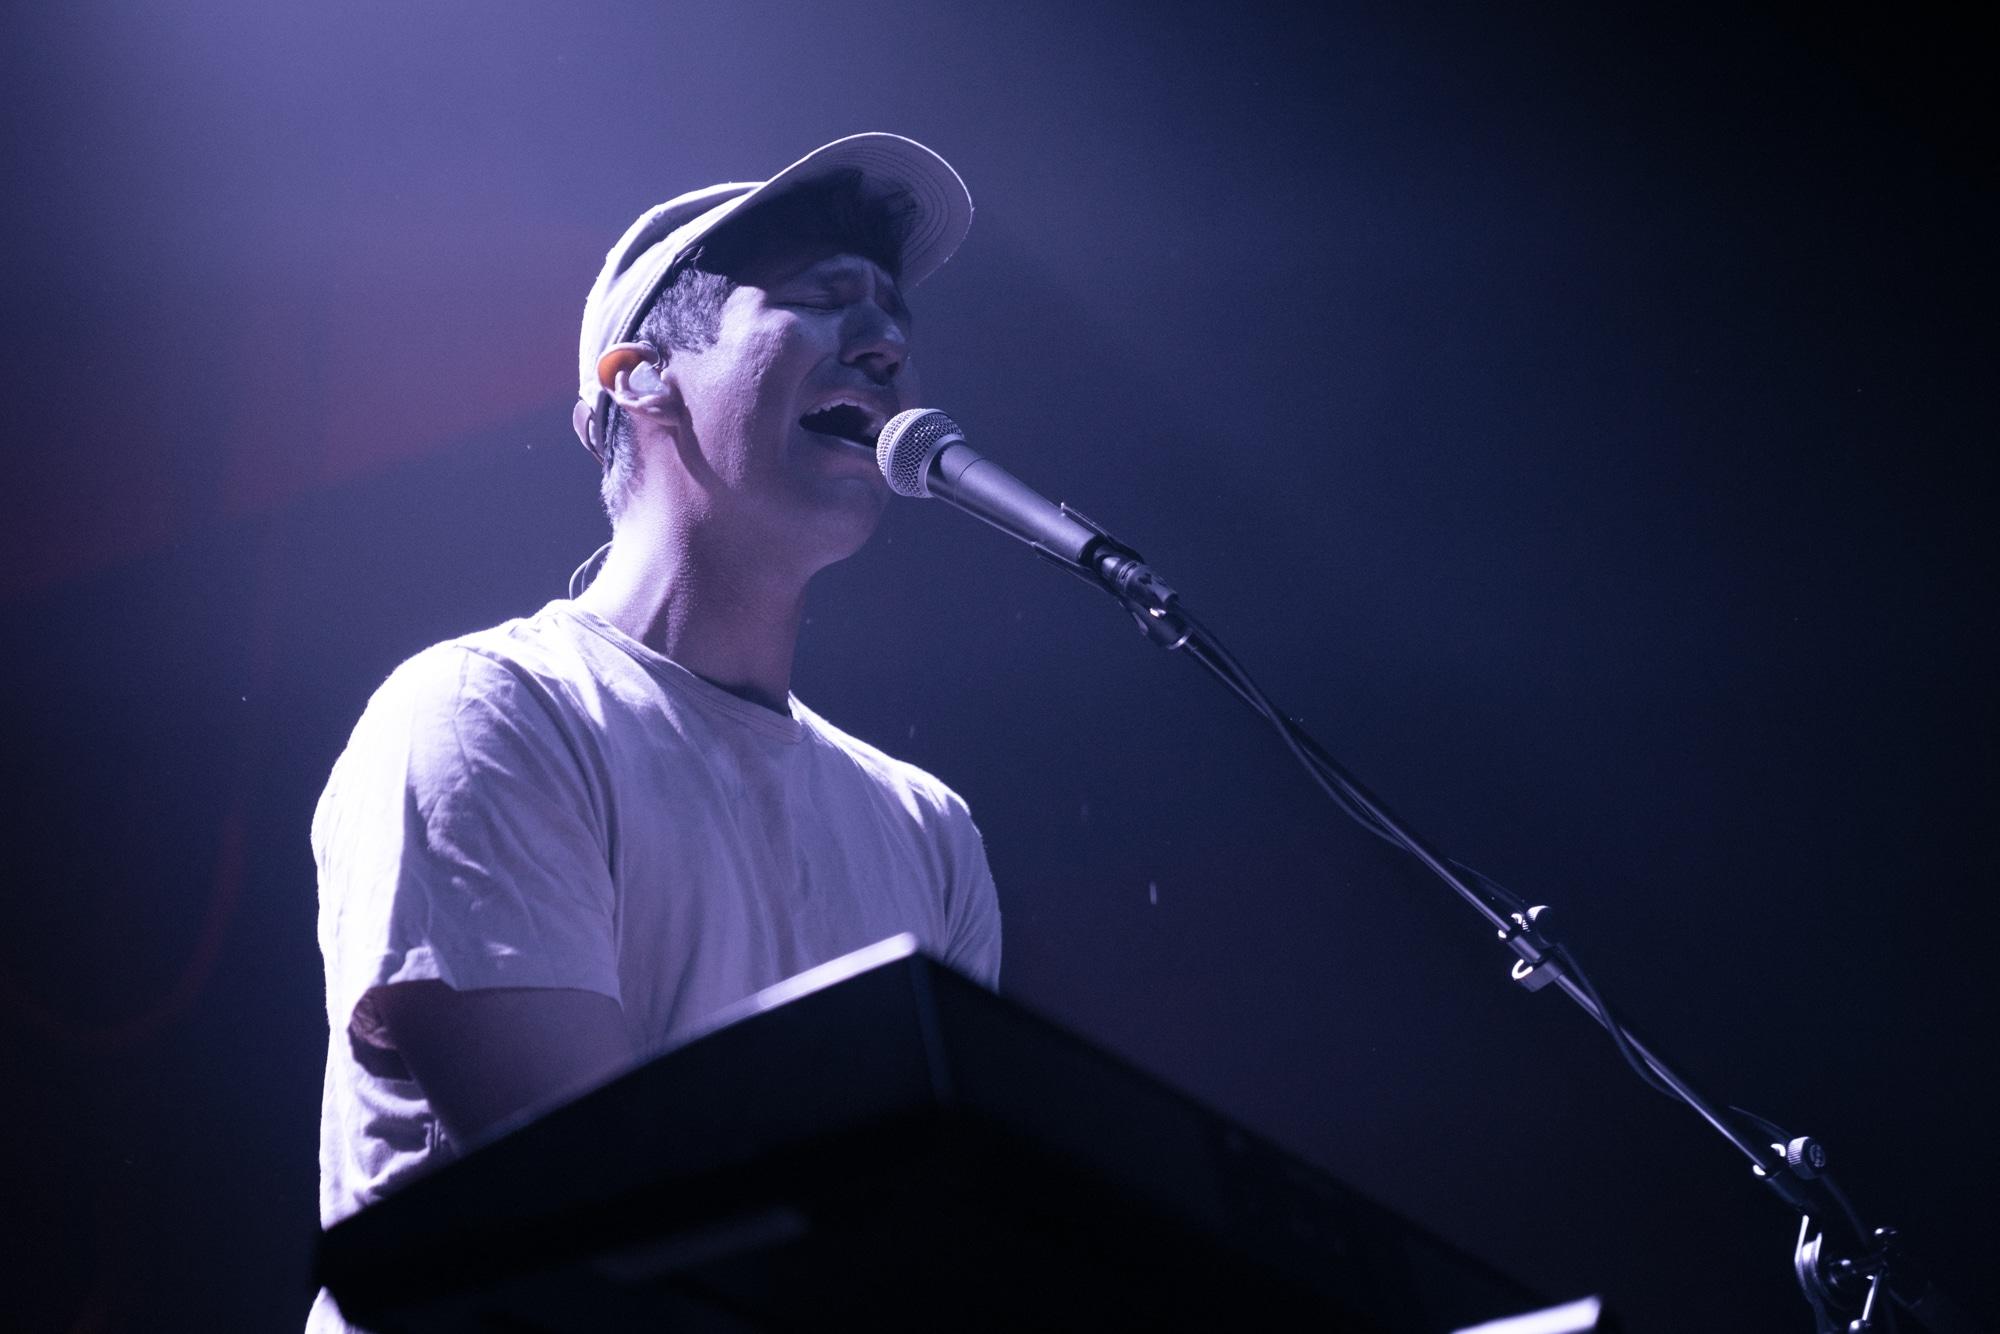 Michl - Photo by Chris Taylor